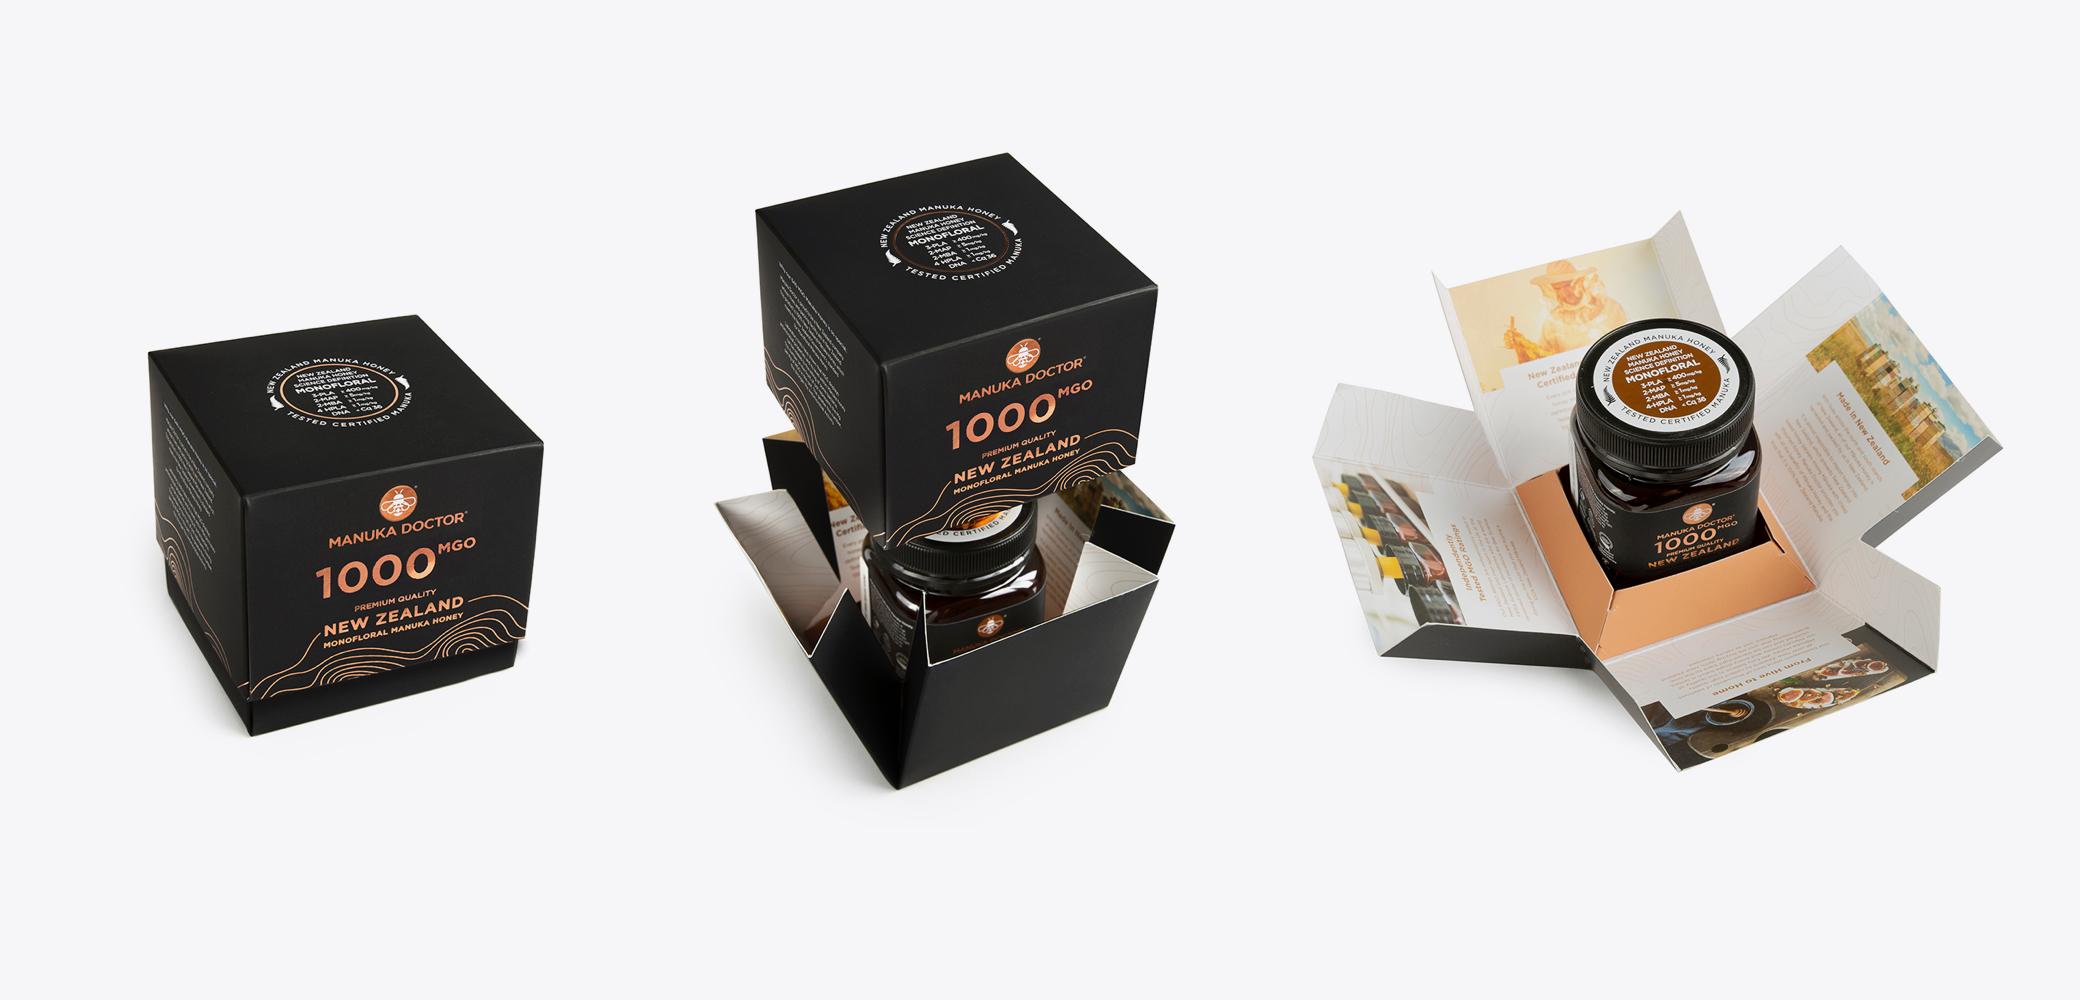 Manuka Doctor Premium Honey